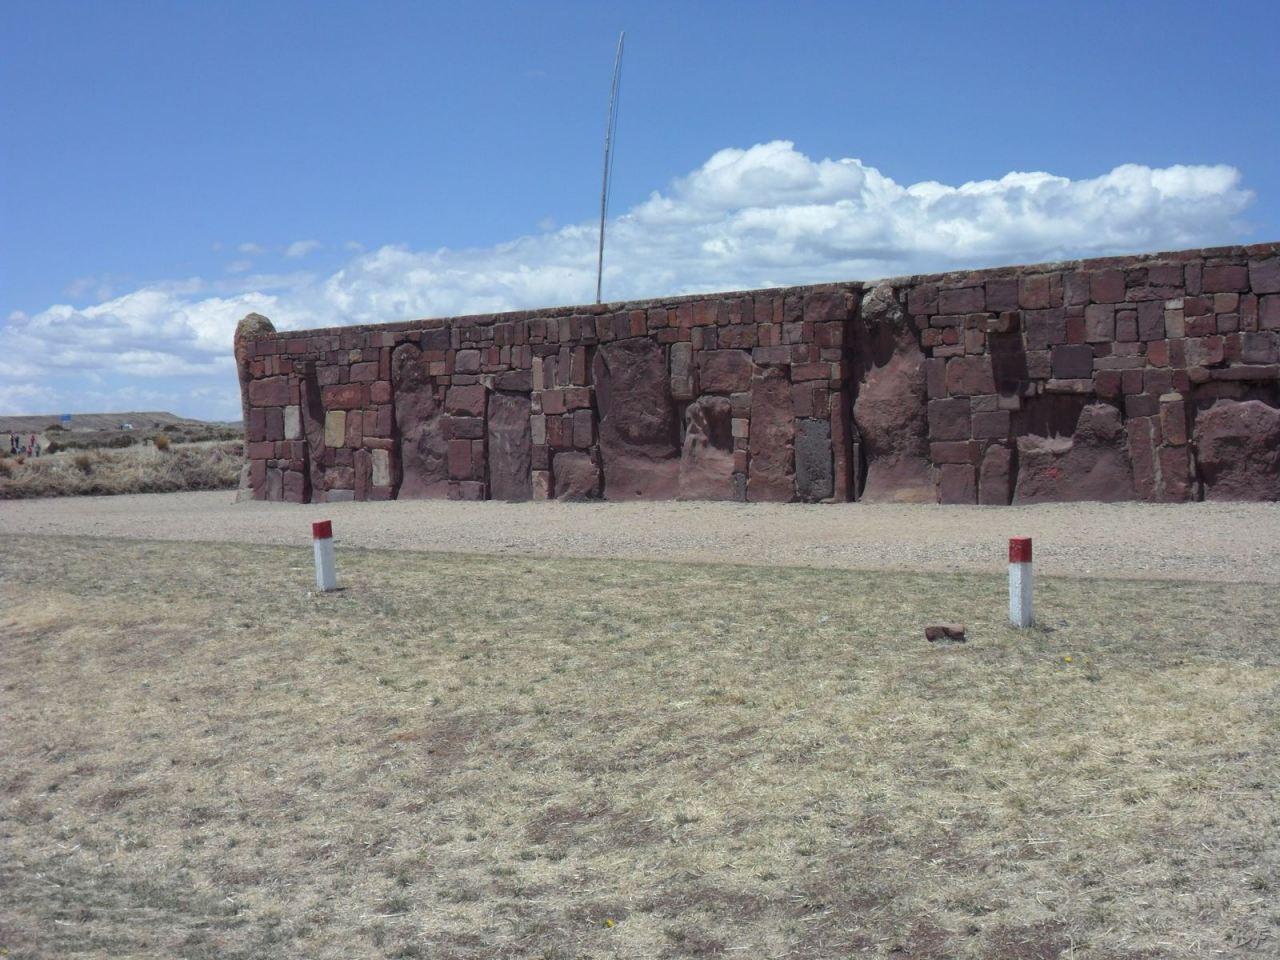 Sito-Megalitico-Piramide-Akapana-Kalasasaya-Menhir-Tiahuanaco-Bolivia-16